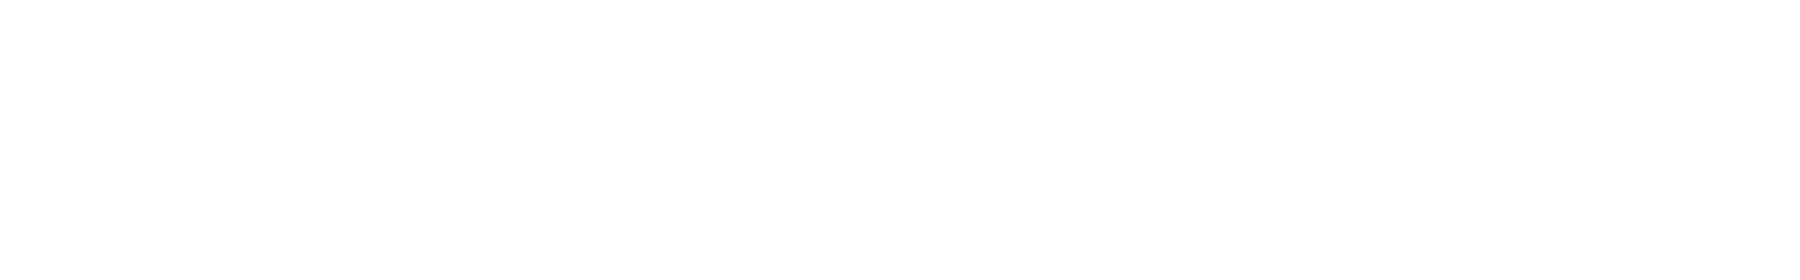 blbc jazzydrums 75 02